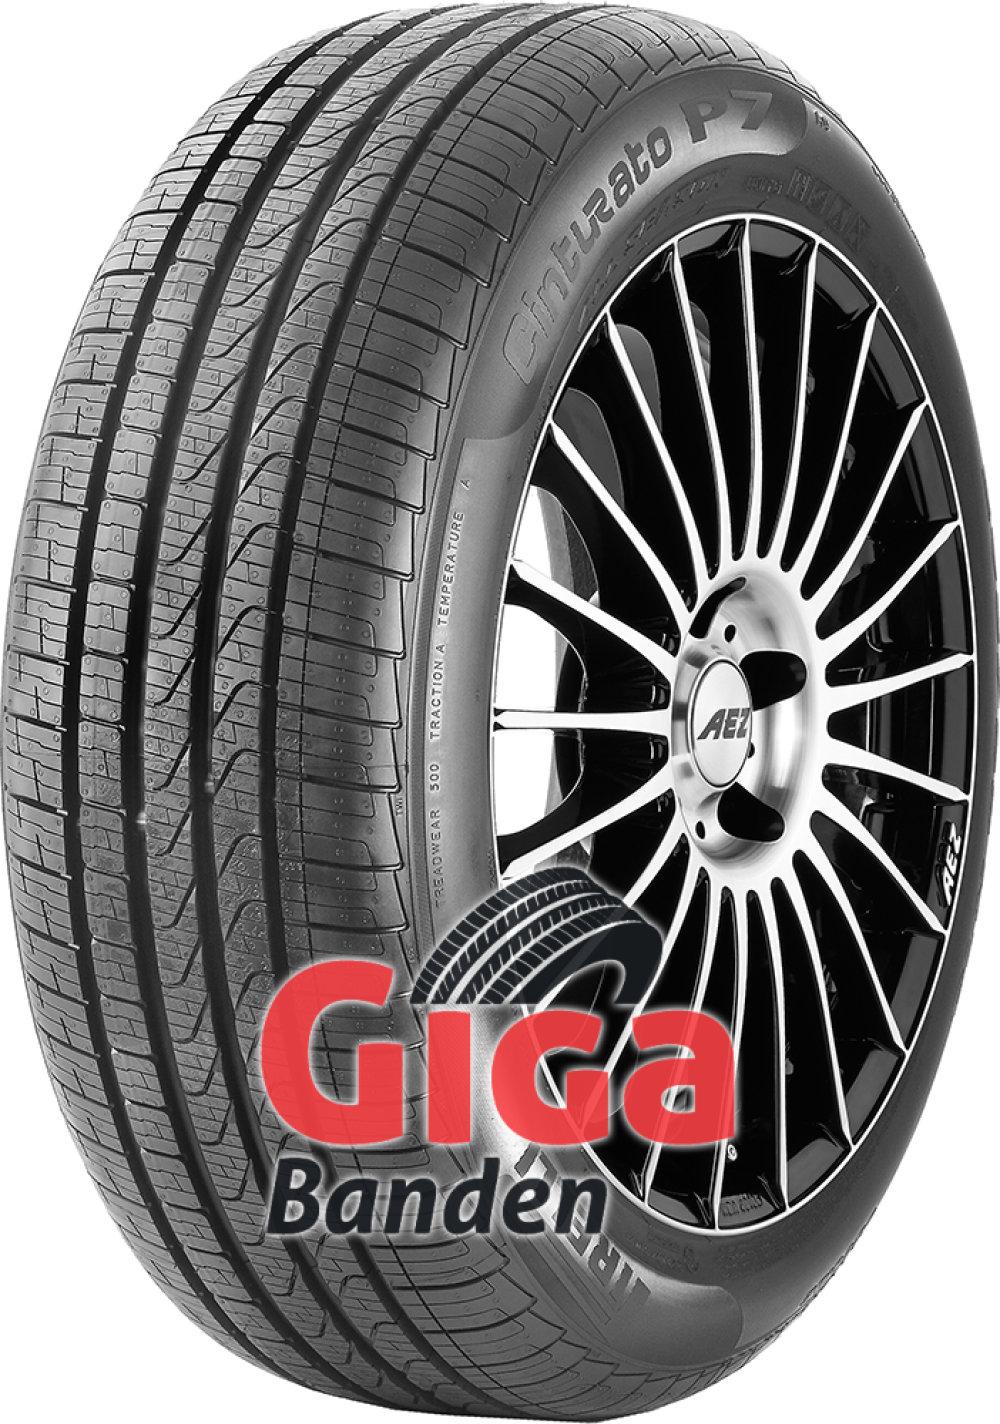 Pirelli Cinturato P7 A/S ( 315/30 R21 105V XL , N0, PNCS )